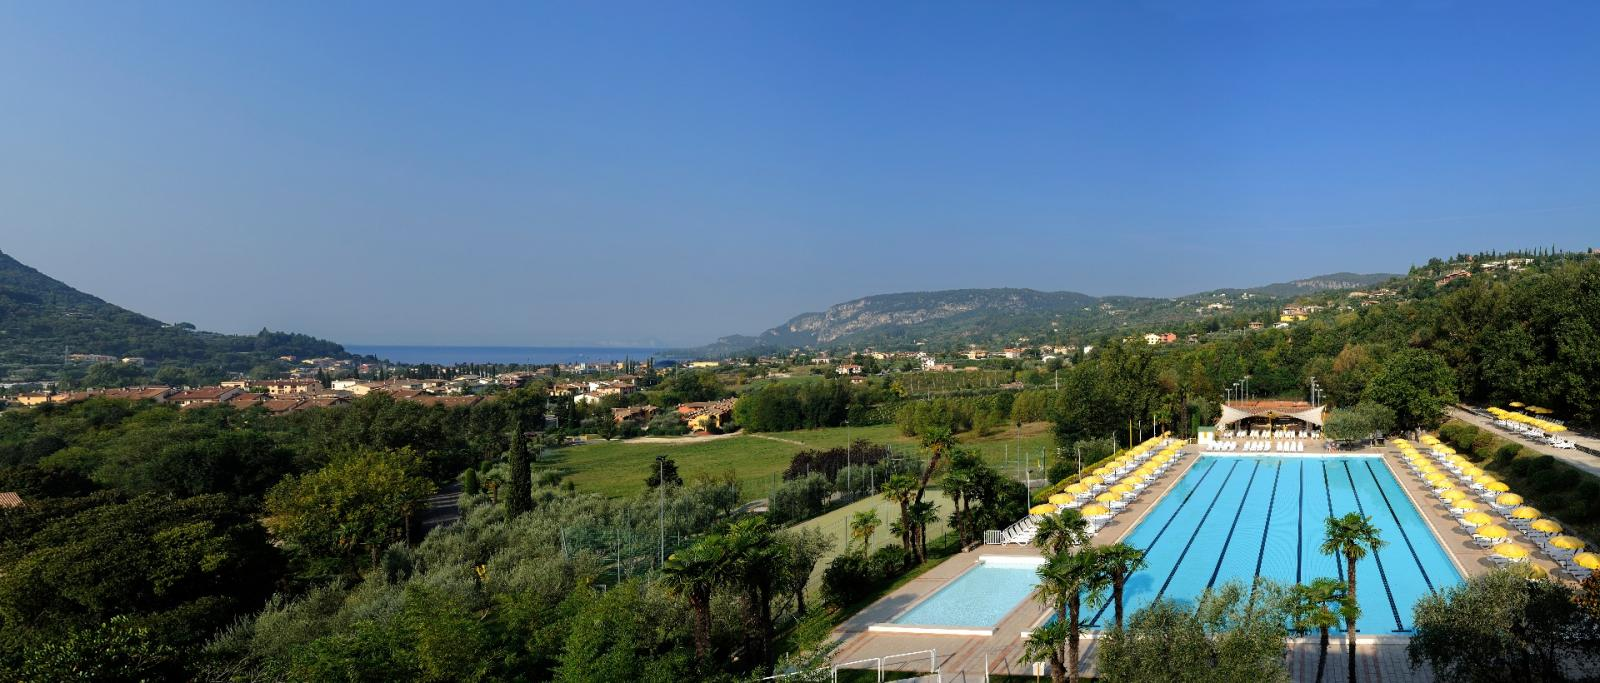 Poiano Resort Hotel Spa